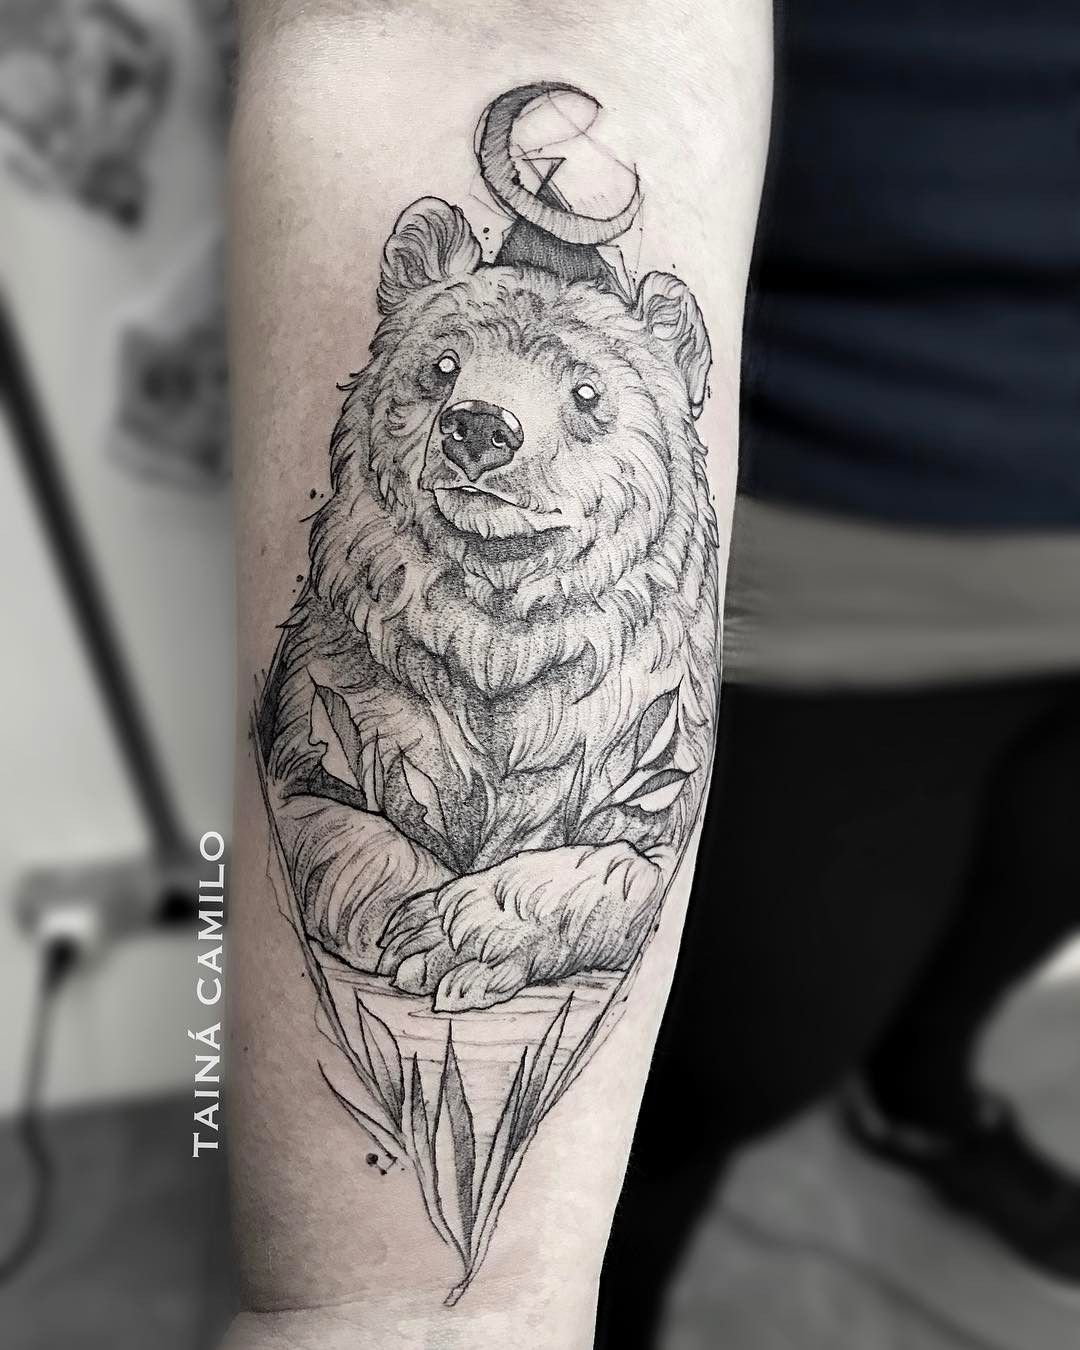 Tattoos: Bear Tattoo Meaning And Symbolism - THE WILD TATTOO